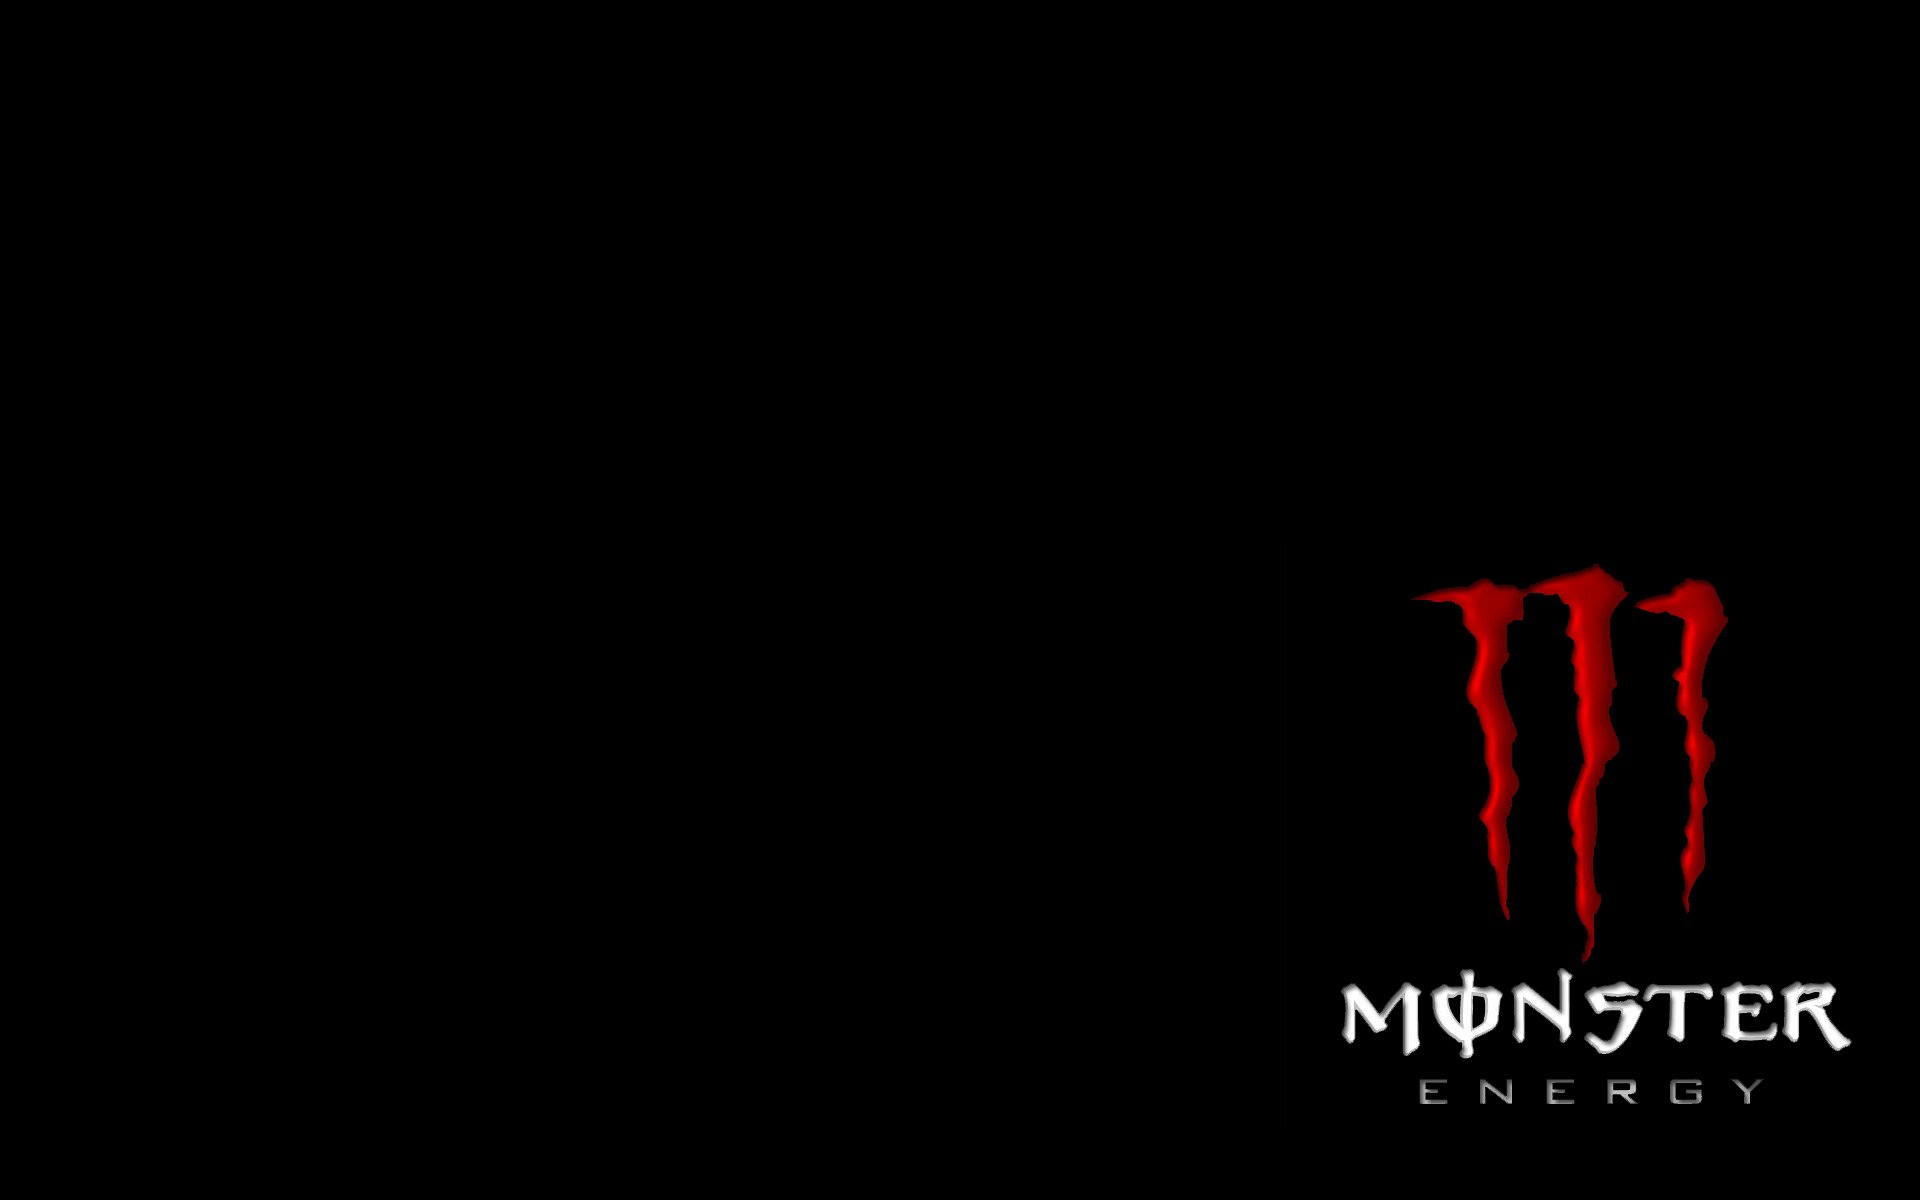 Monster-Energy-HD-Taringa-wallpaper-wpc5807330